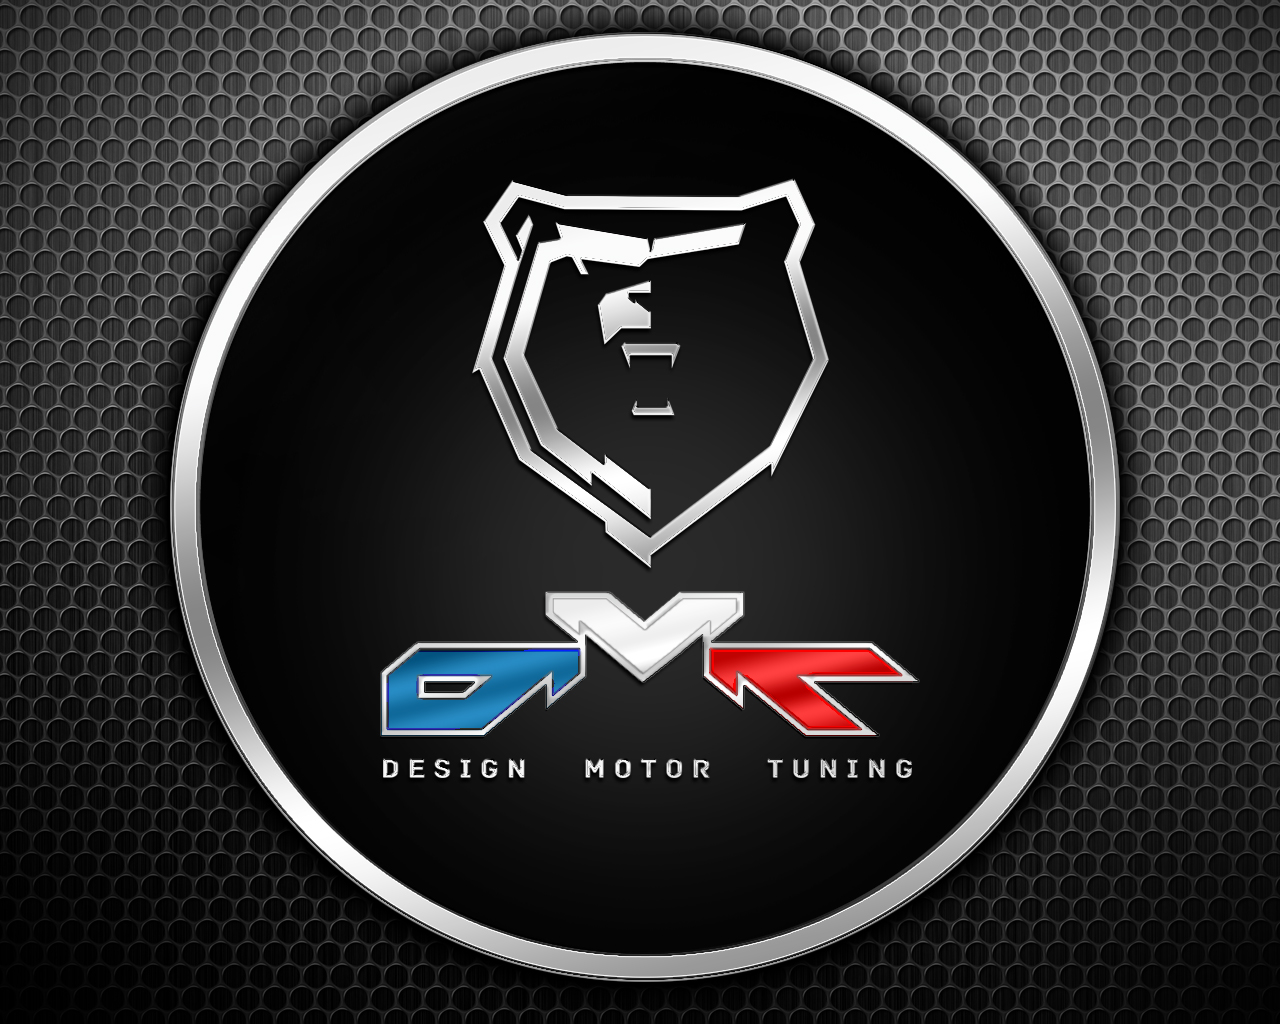 Логотип для Тюнинг Ателье фото f_205553e519b8537f.jpg